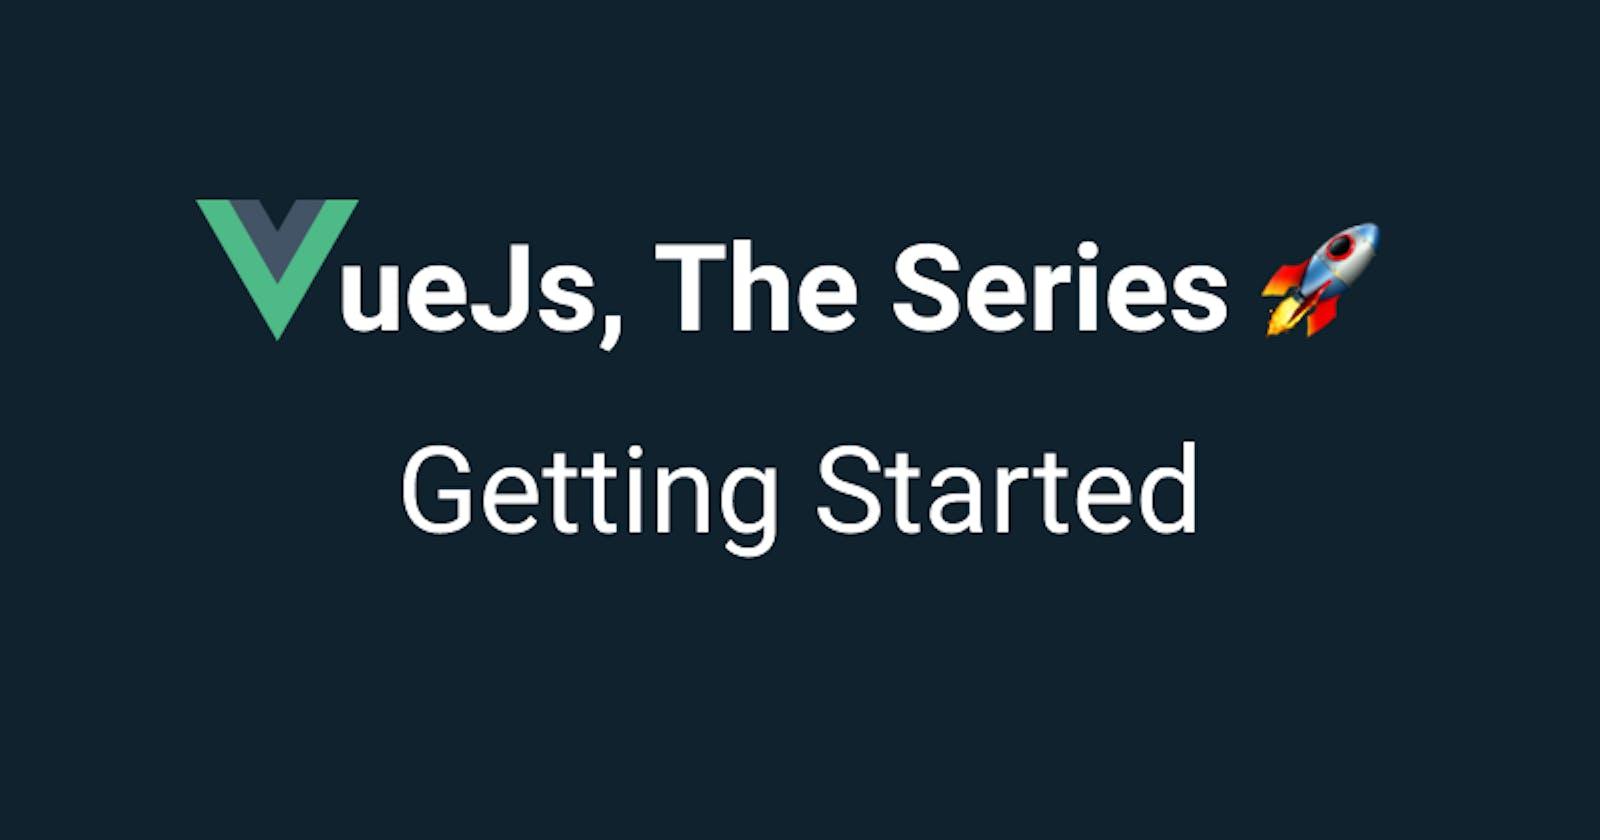 VueJs - Getting Started